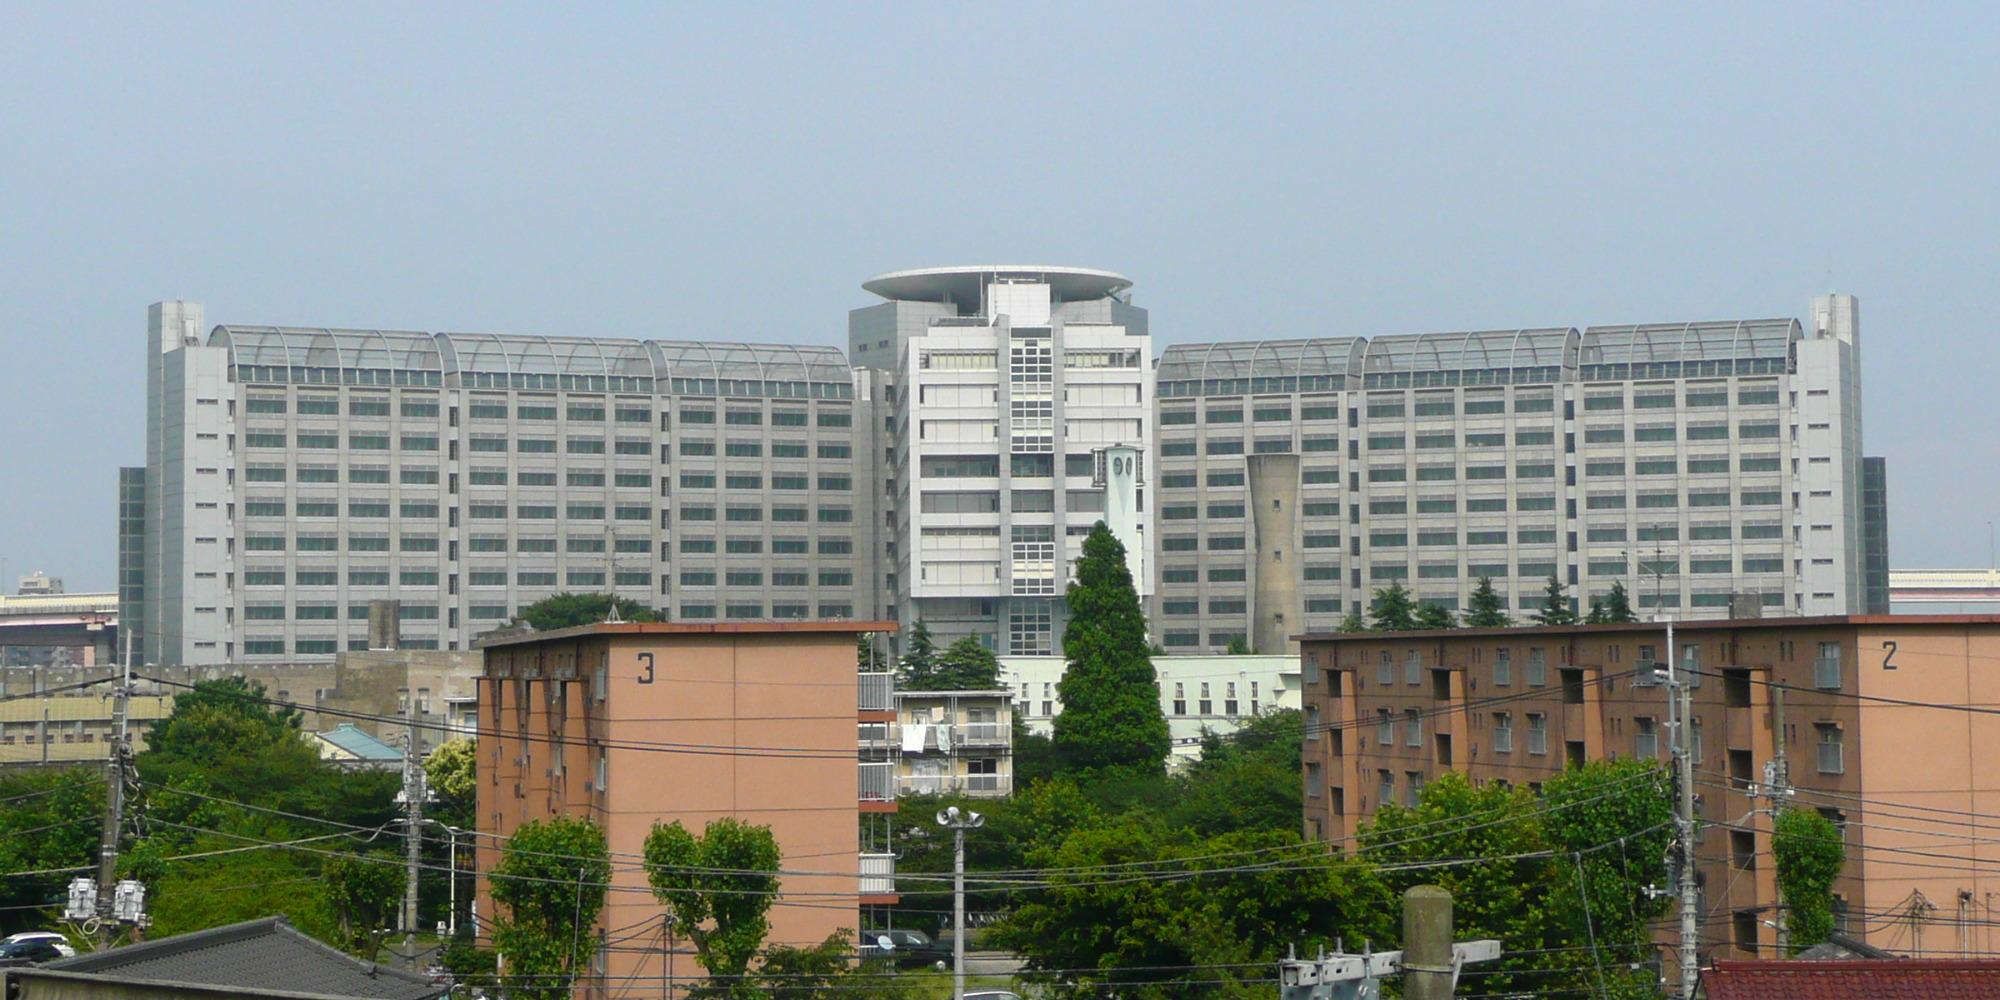 Dating στη Γιοκοχάμα Ιαπωνία Σακραμέντο CA ιστοσελίδες γνωριμιών